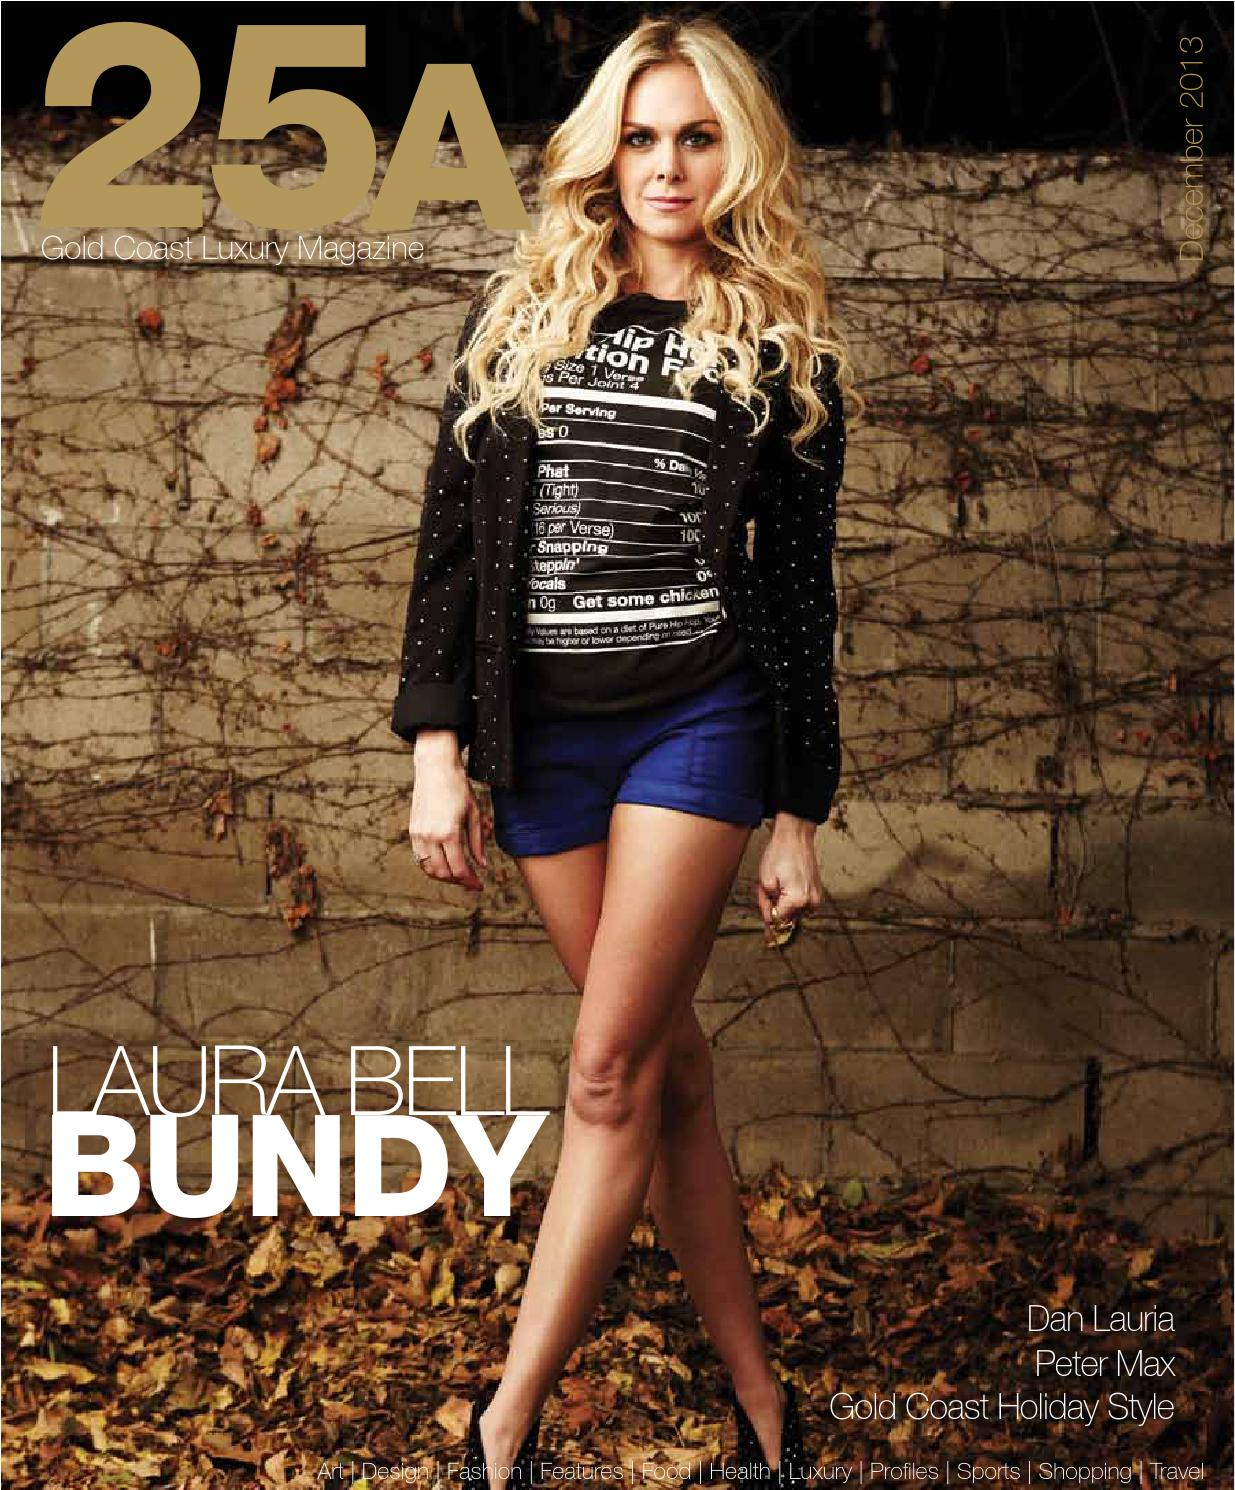 Amber Goldfarb Nude 25a magazine december 2013jason feinberg - issuu